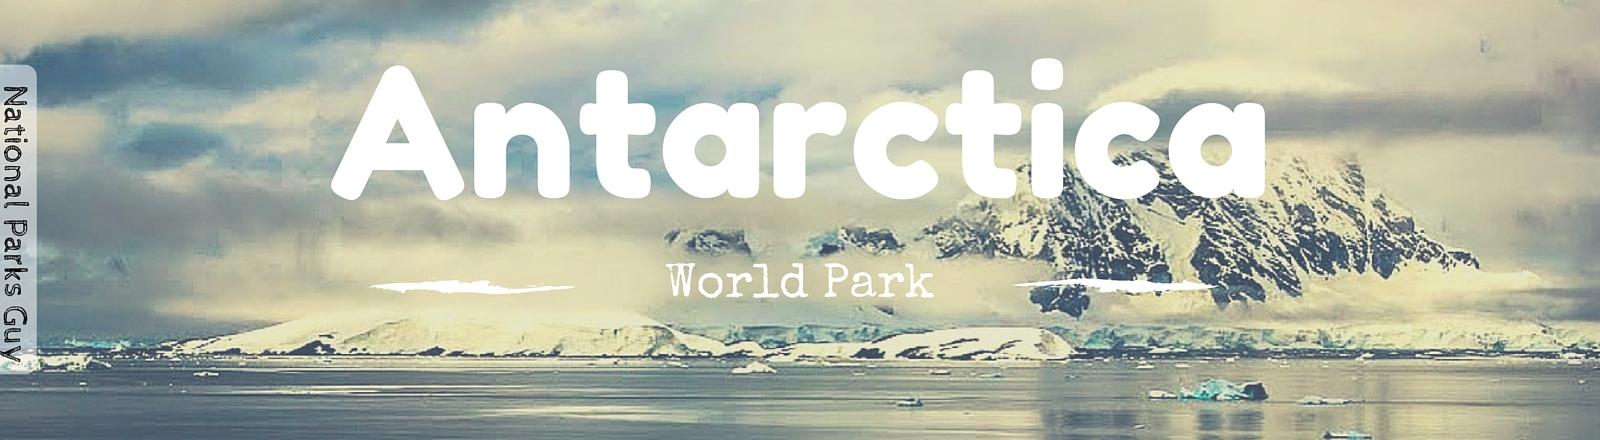 Antarctica World Park, National Parks Guy